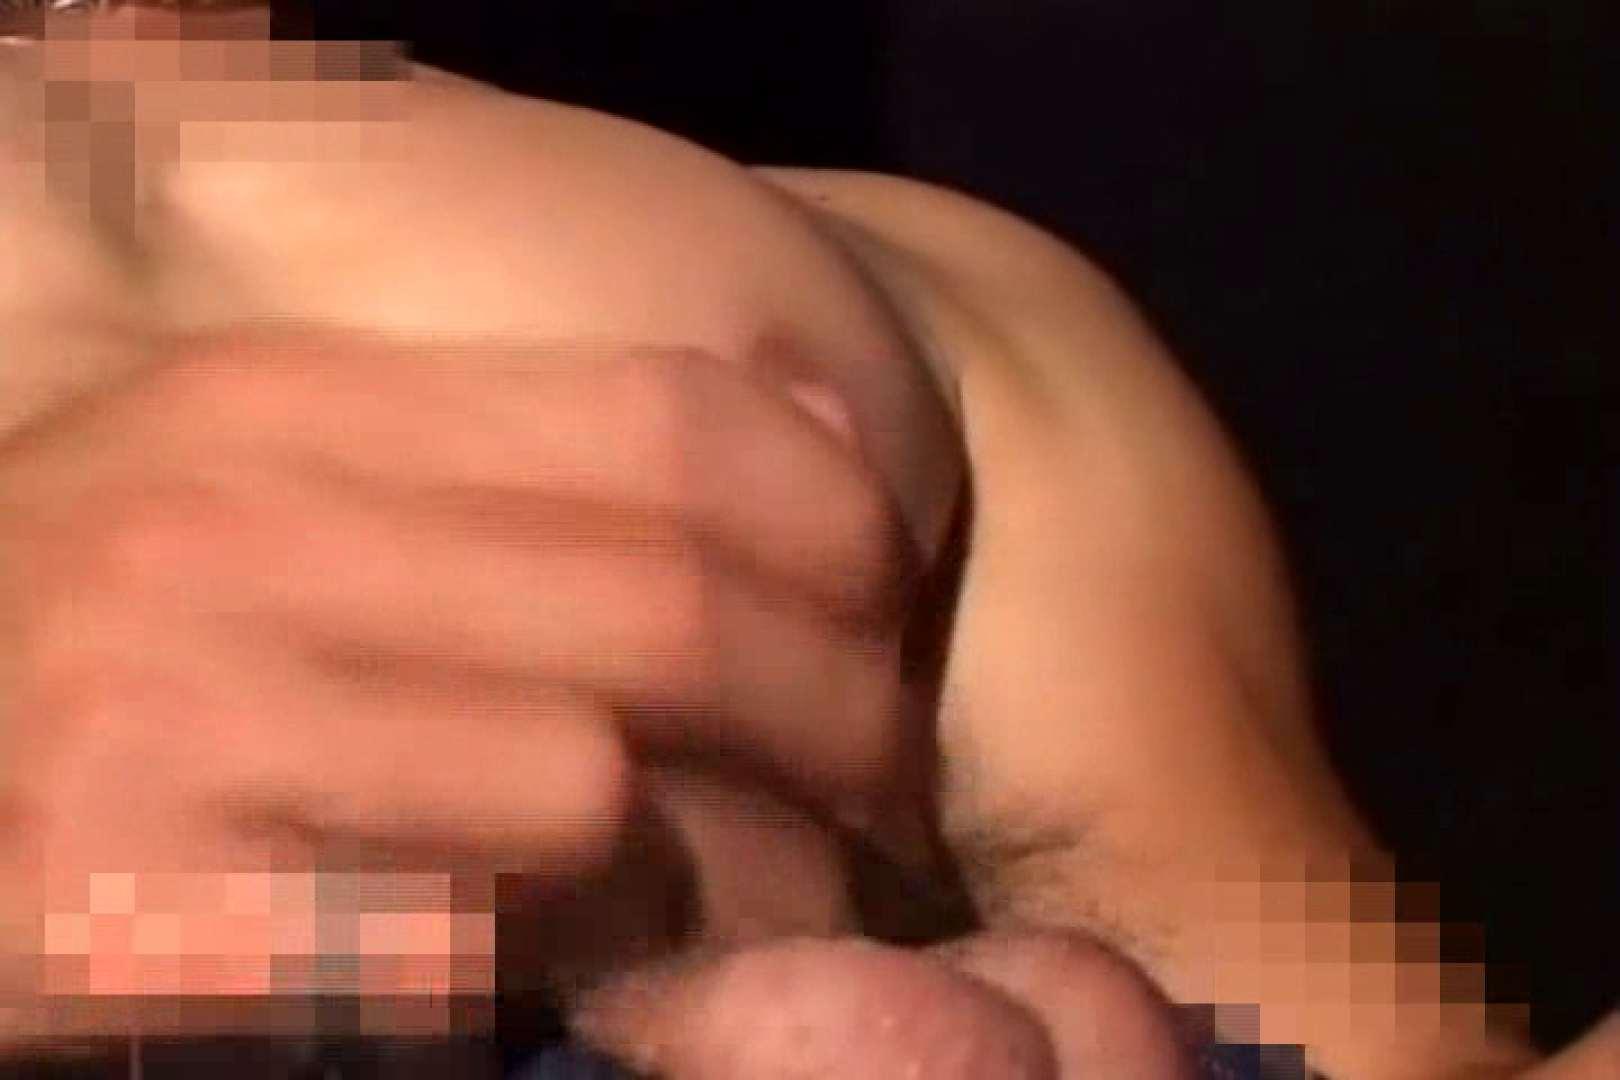 Beautiful muscle モッコリ野郎達!Vol.04 ドキュメント おちんちん画像 49連発 15